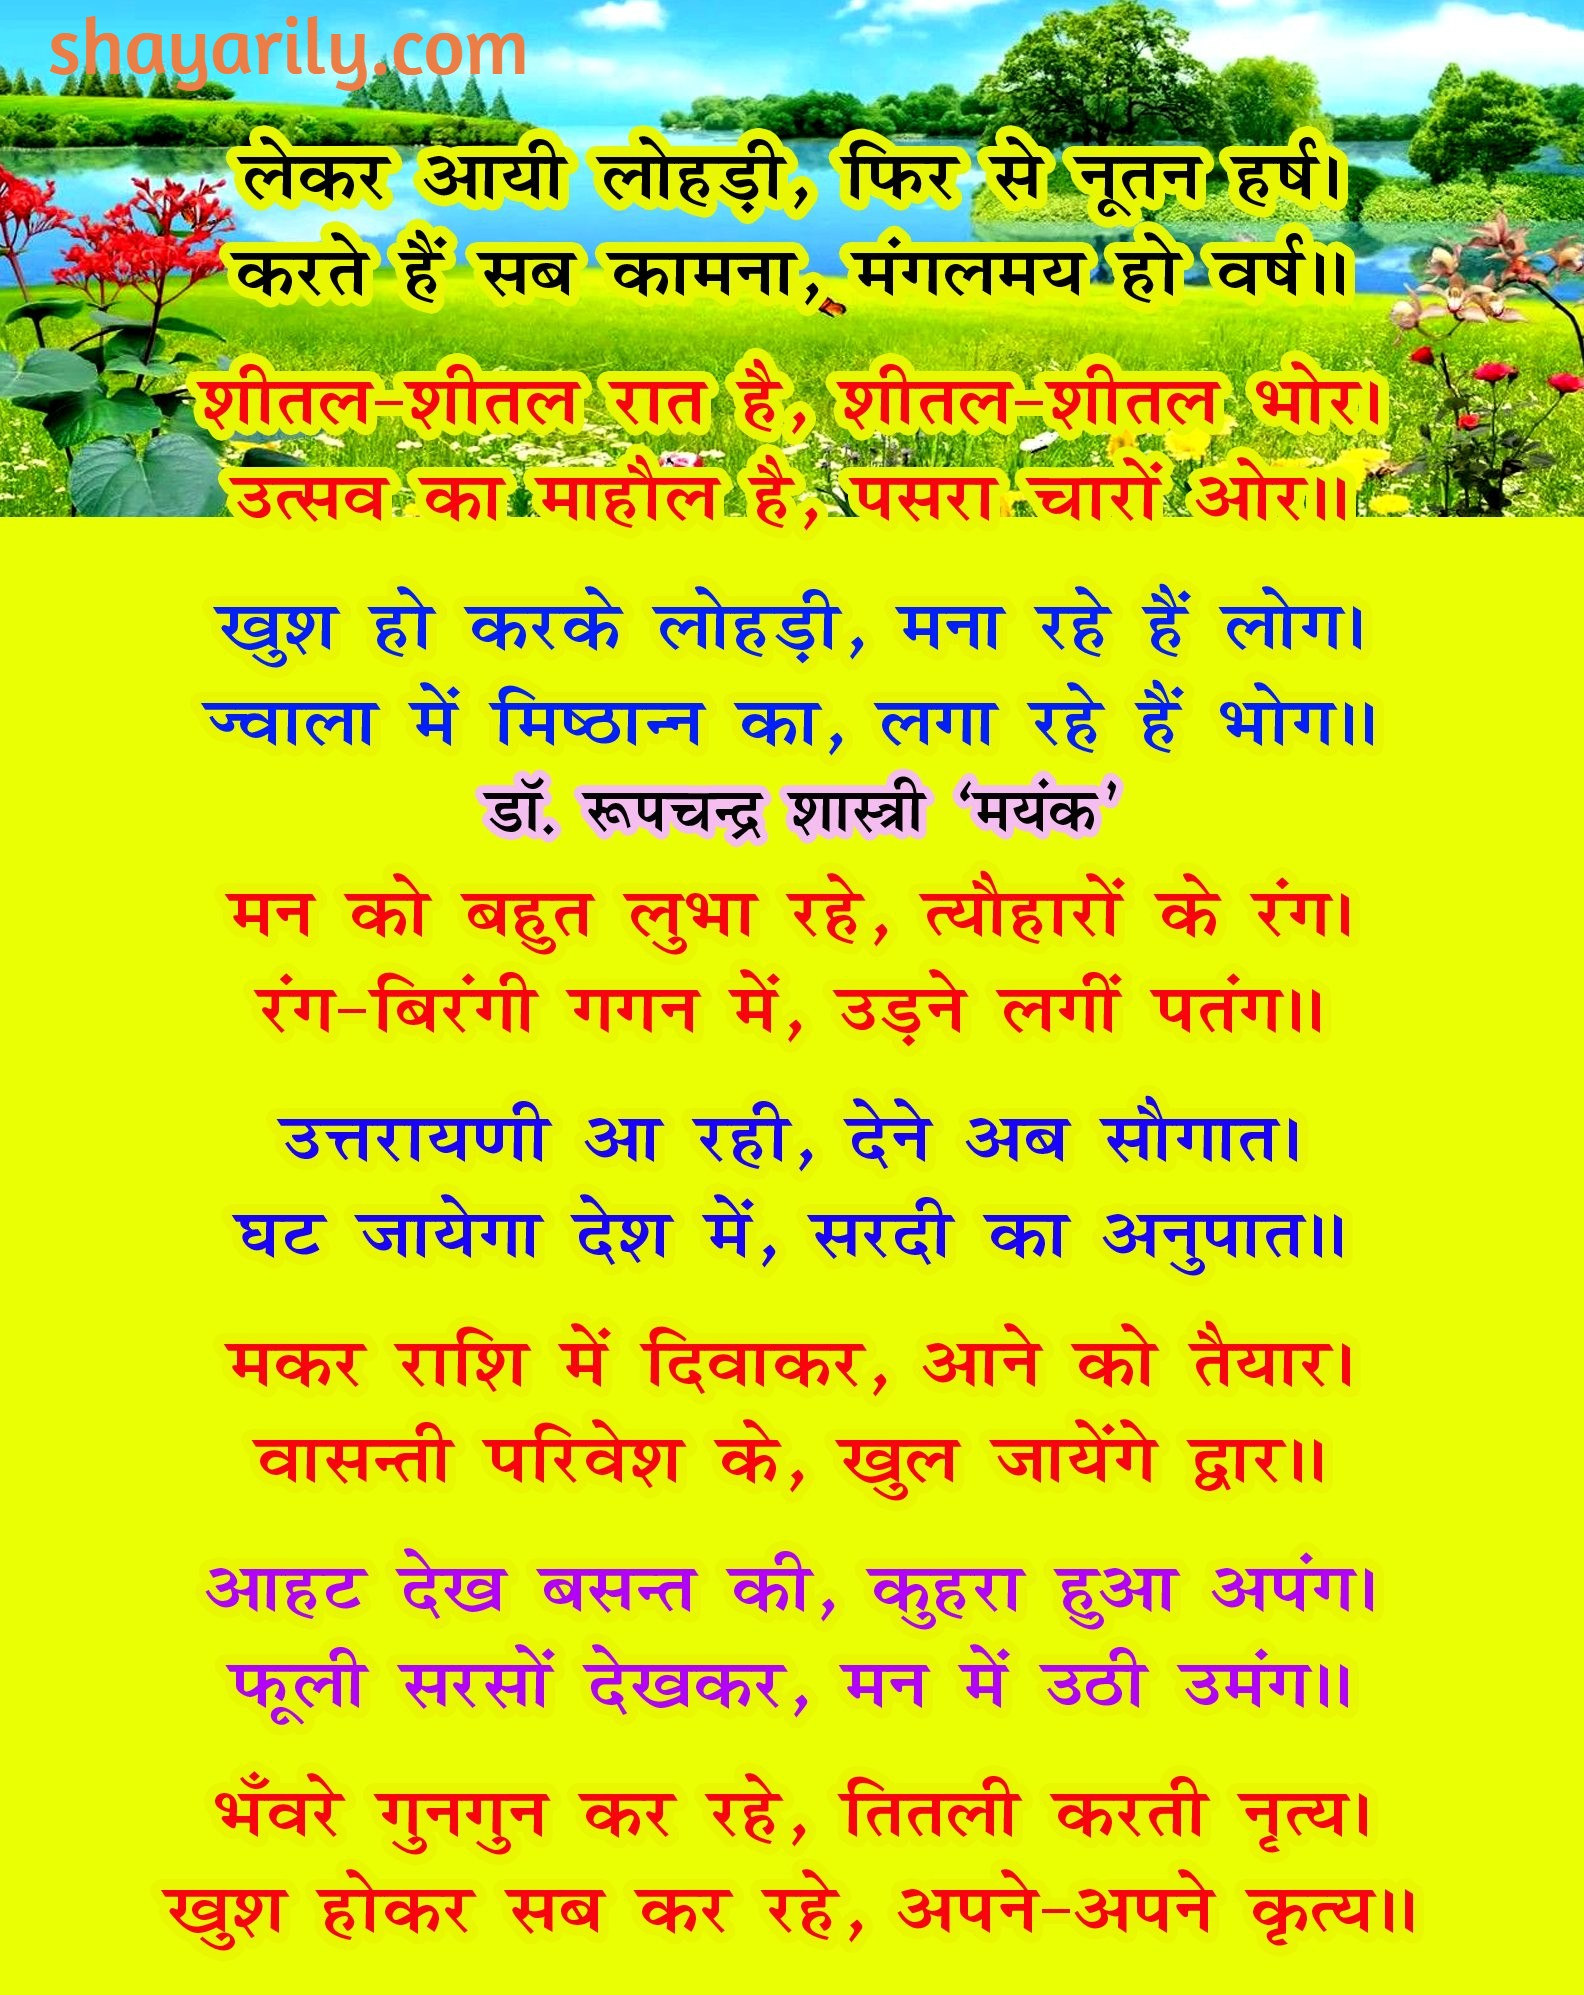 Lohri Poem By Dr Roopchandra Shastri Mayank in Hindi